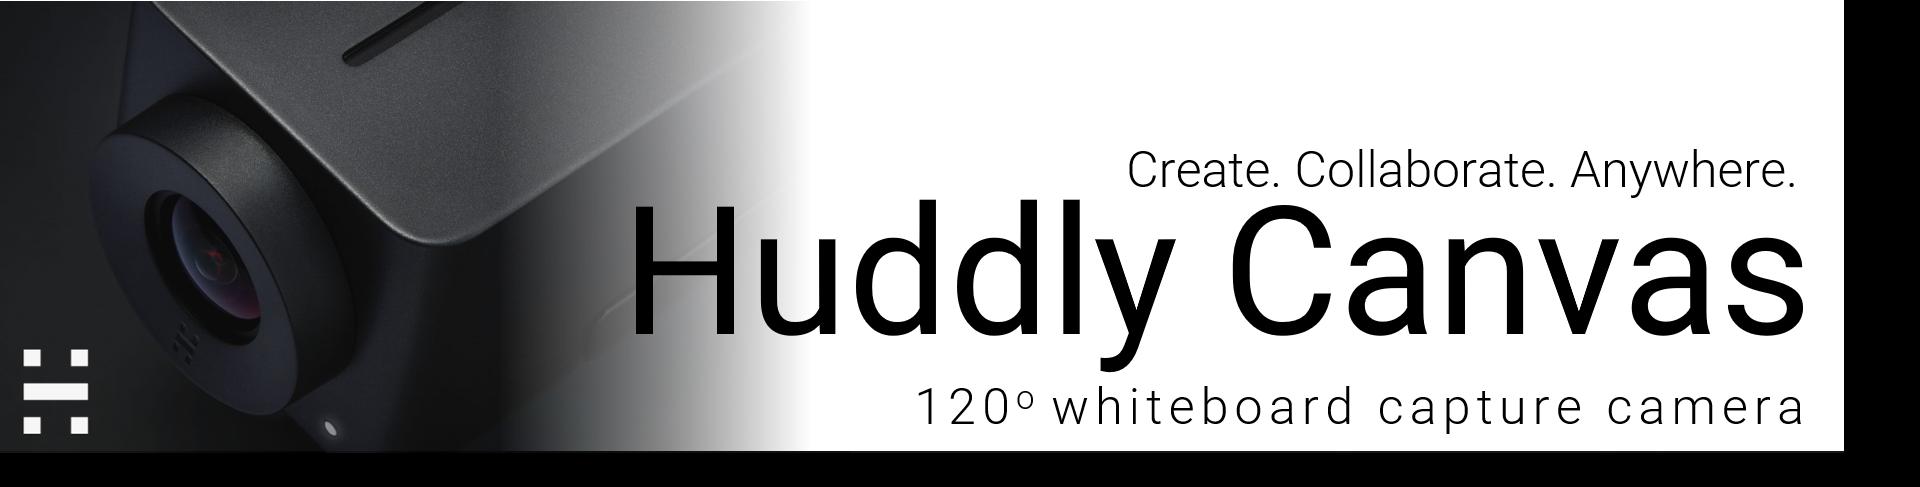 Huddly Canvas Whiteboard Capture Camera